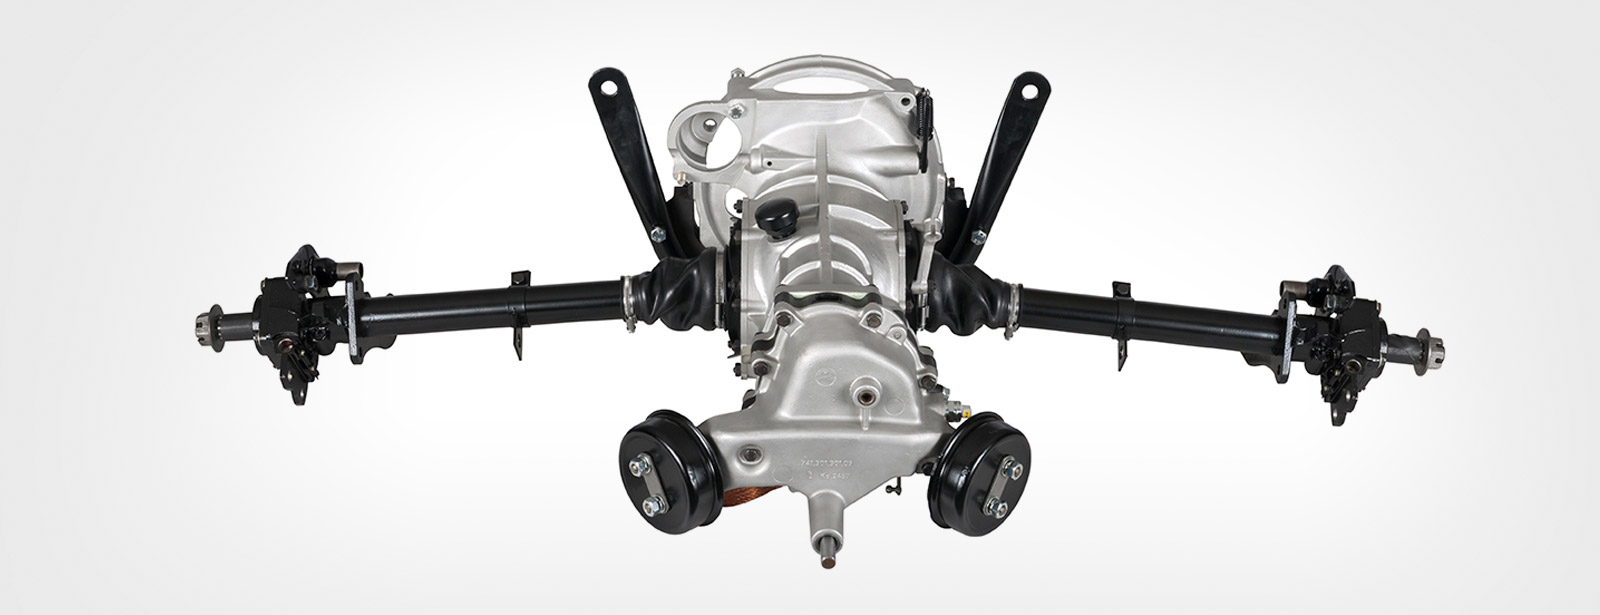 Porsche - Transmission - Completion